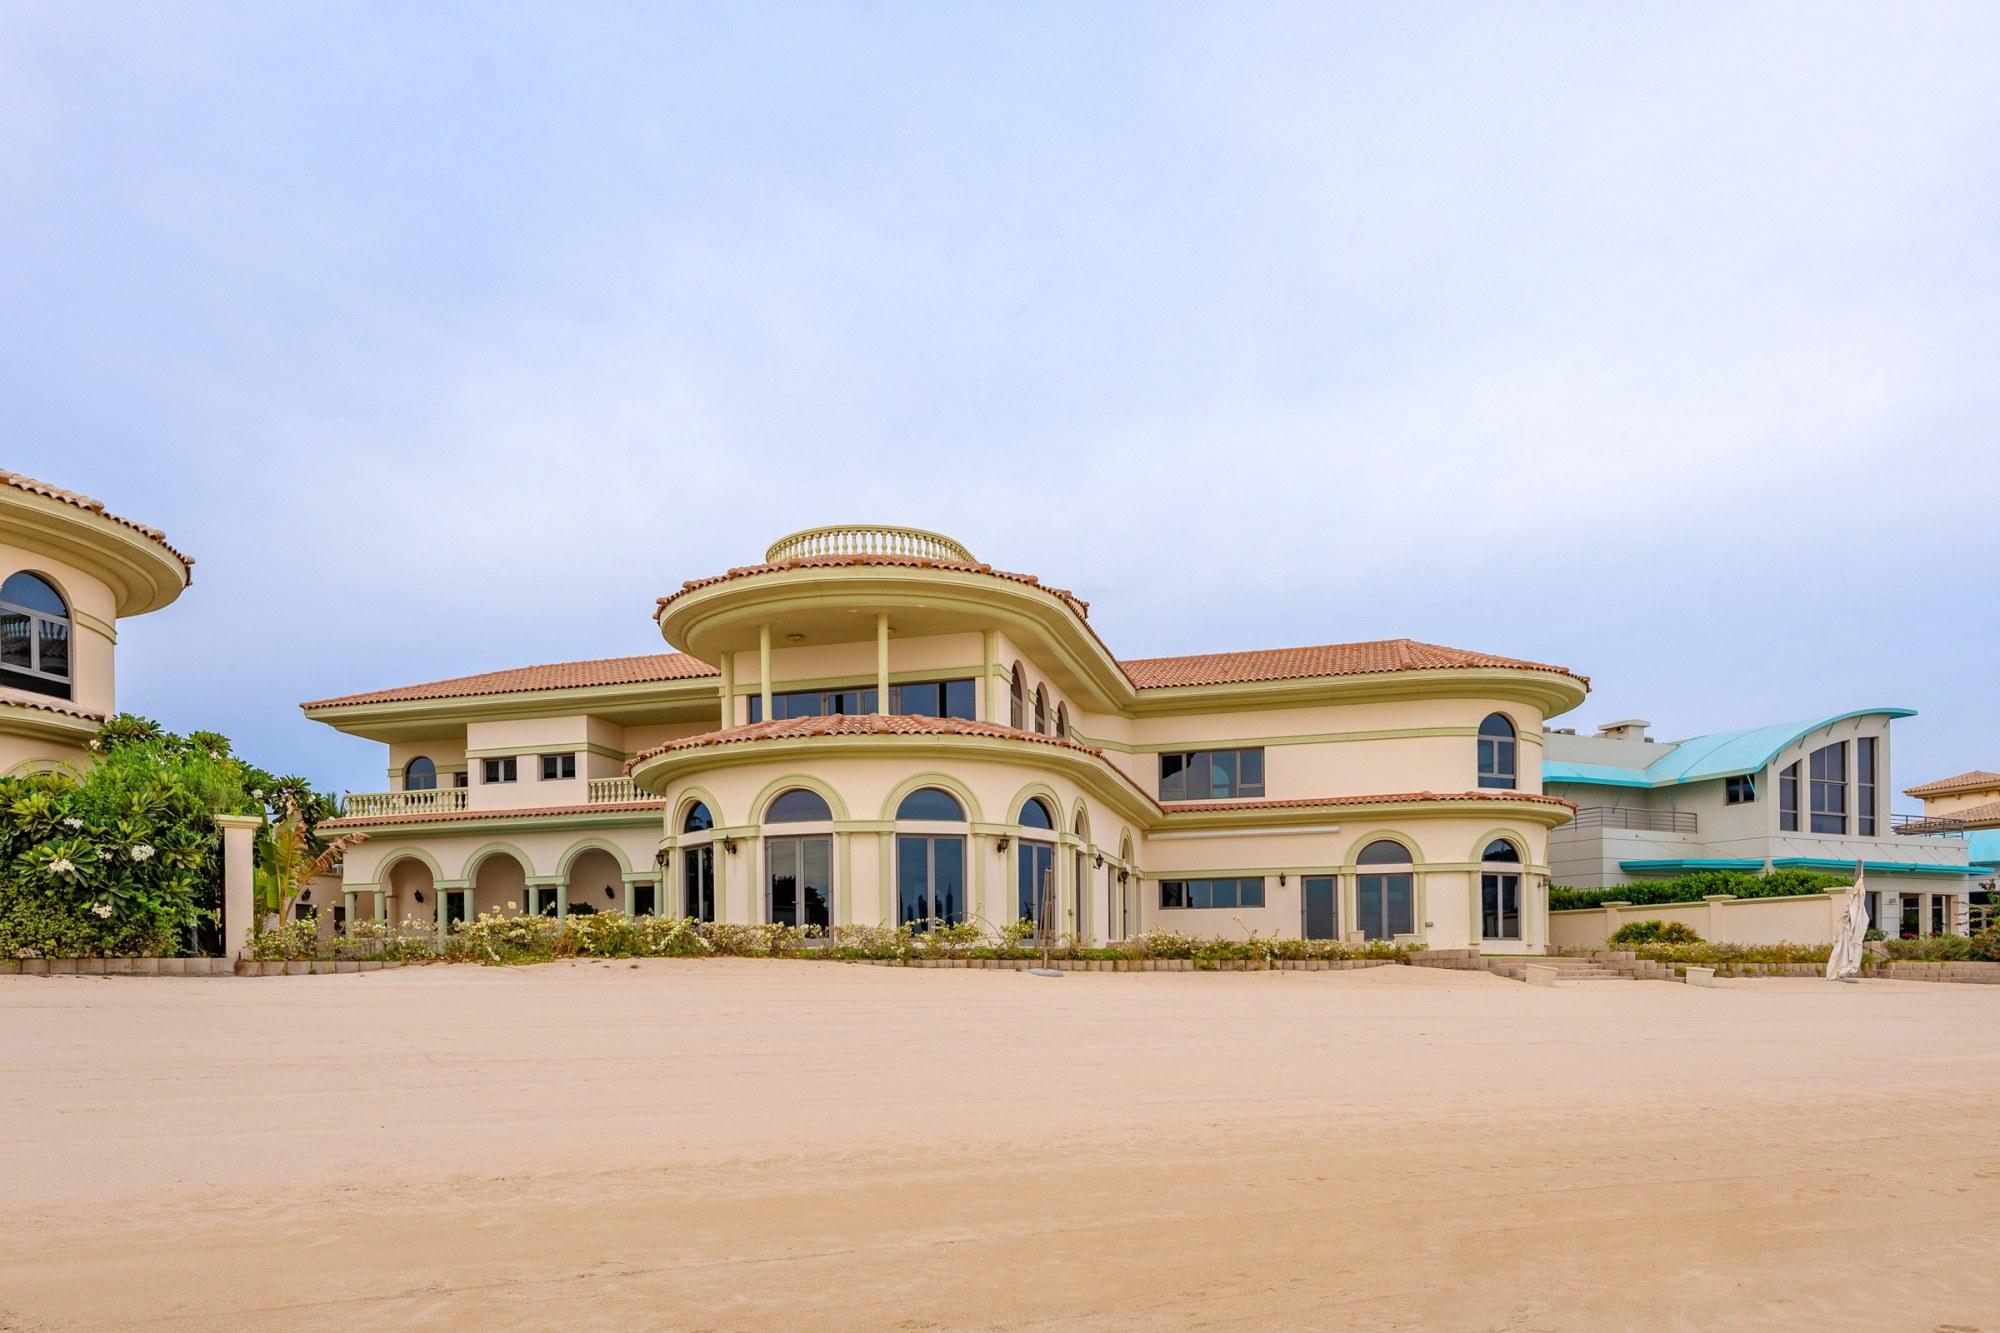 French Riviera Style 5 BR Beachfront Villa